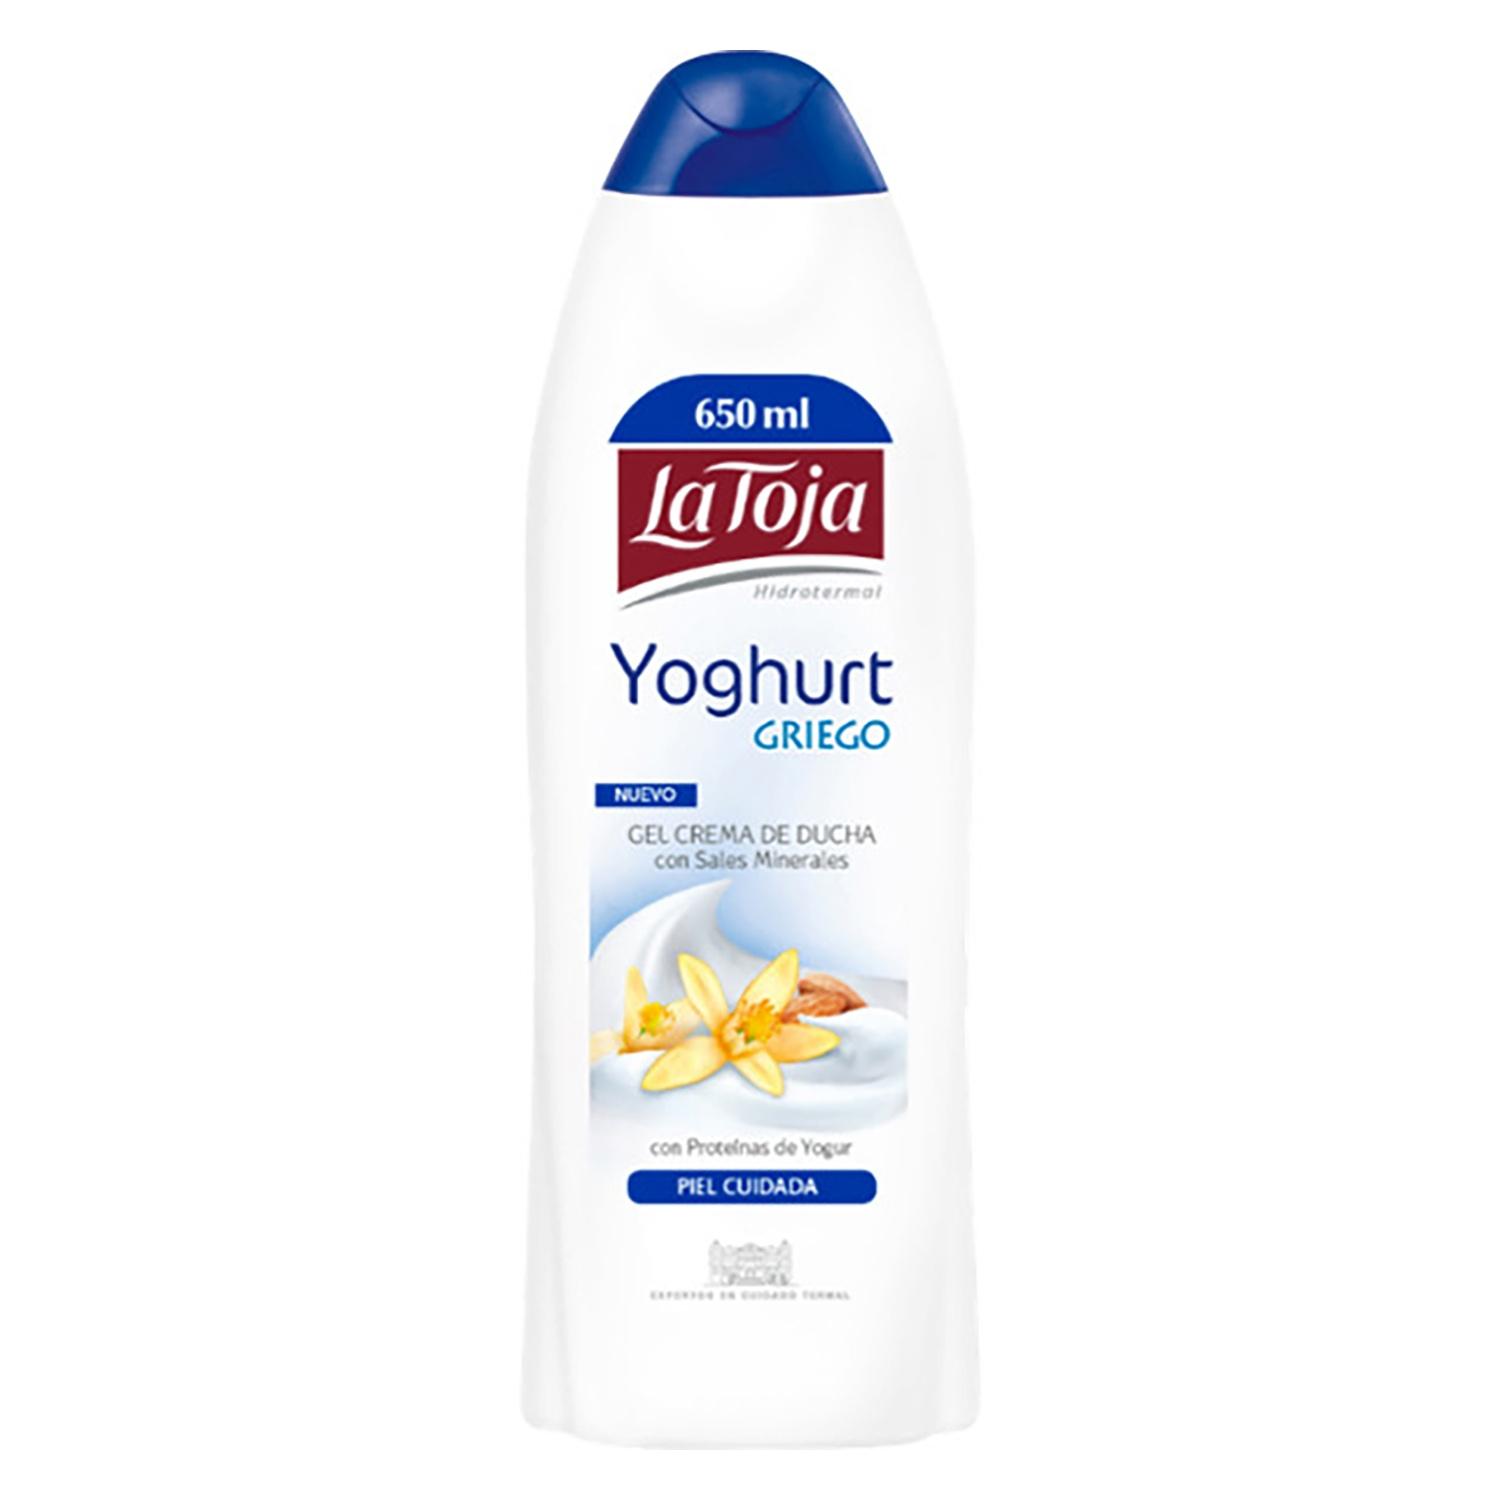 Gel crema de ducha yoghurt griego la toja carrefour for Duchas para piscinas carrefour